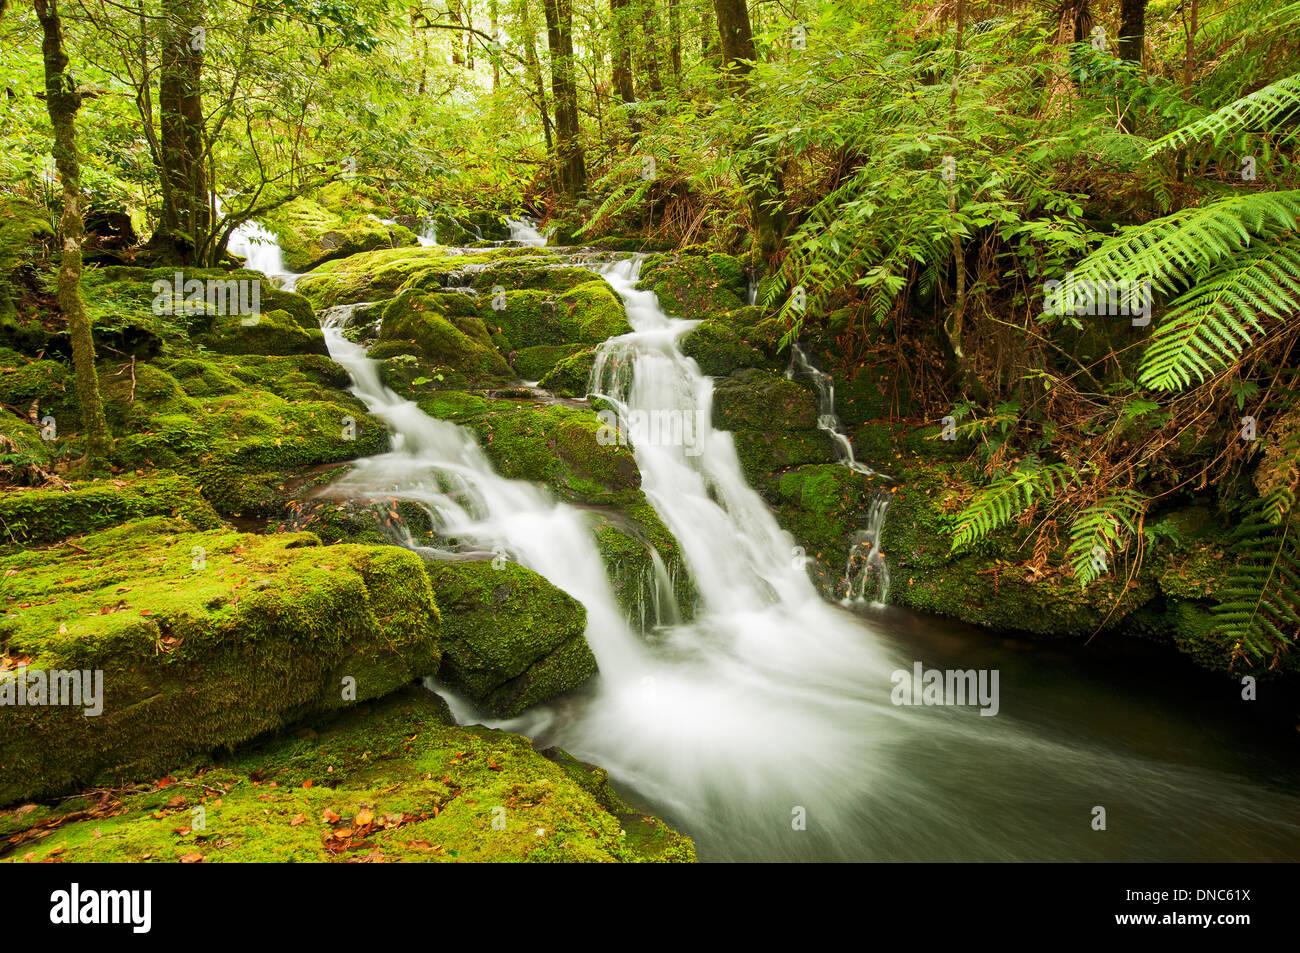 Small creek running through subtropical rainforest. - Stock Image